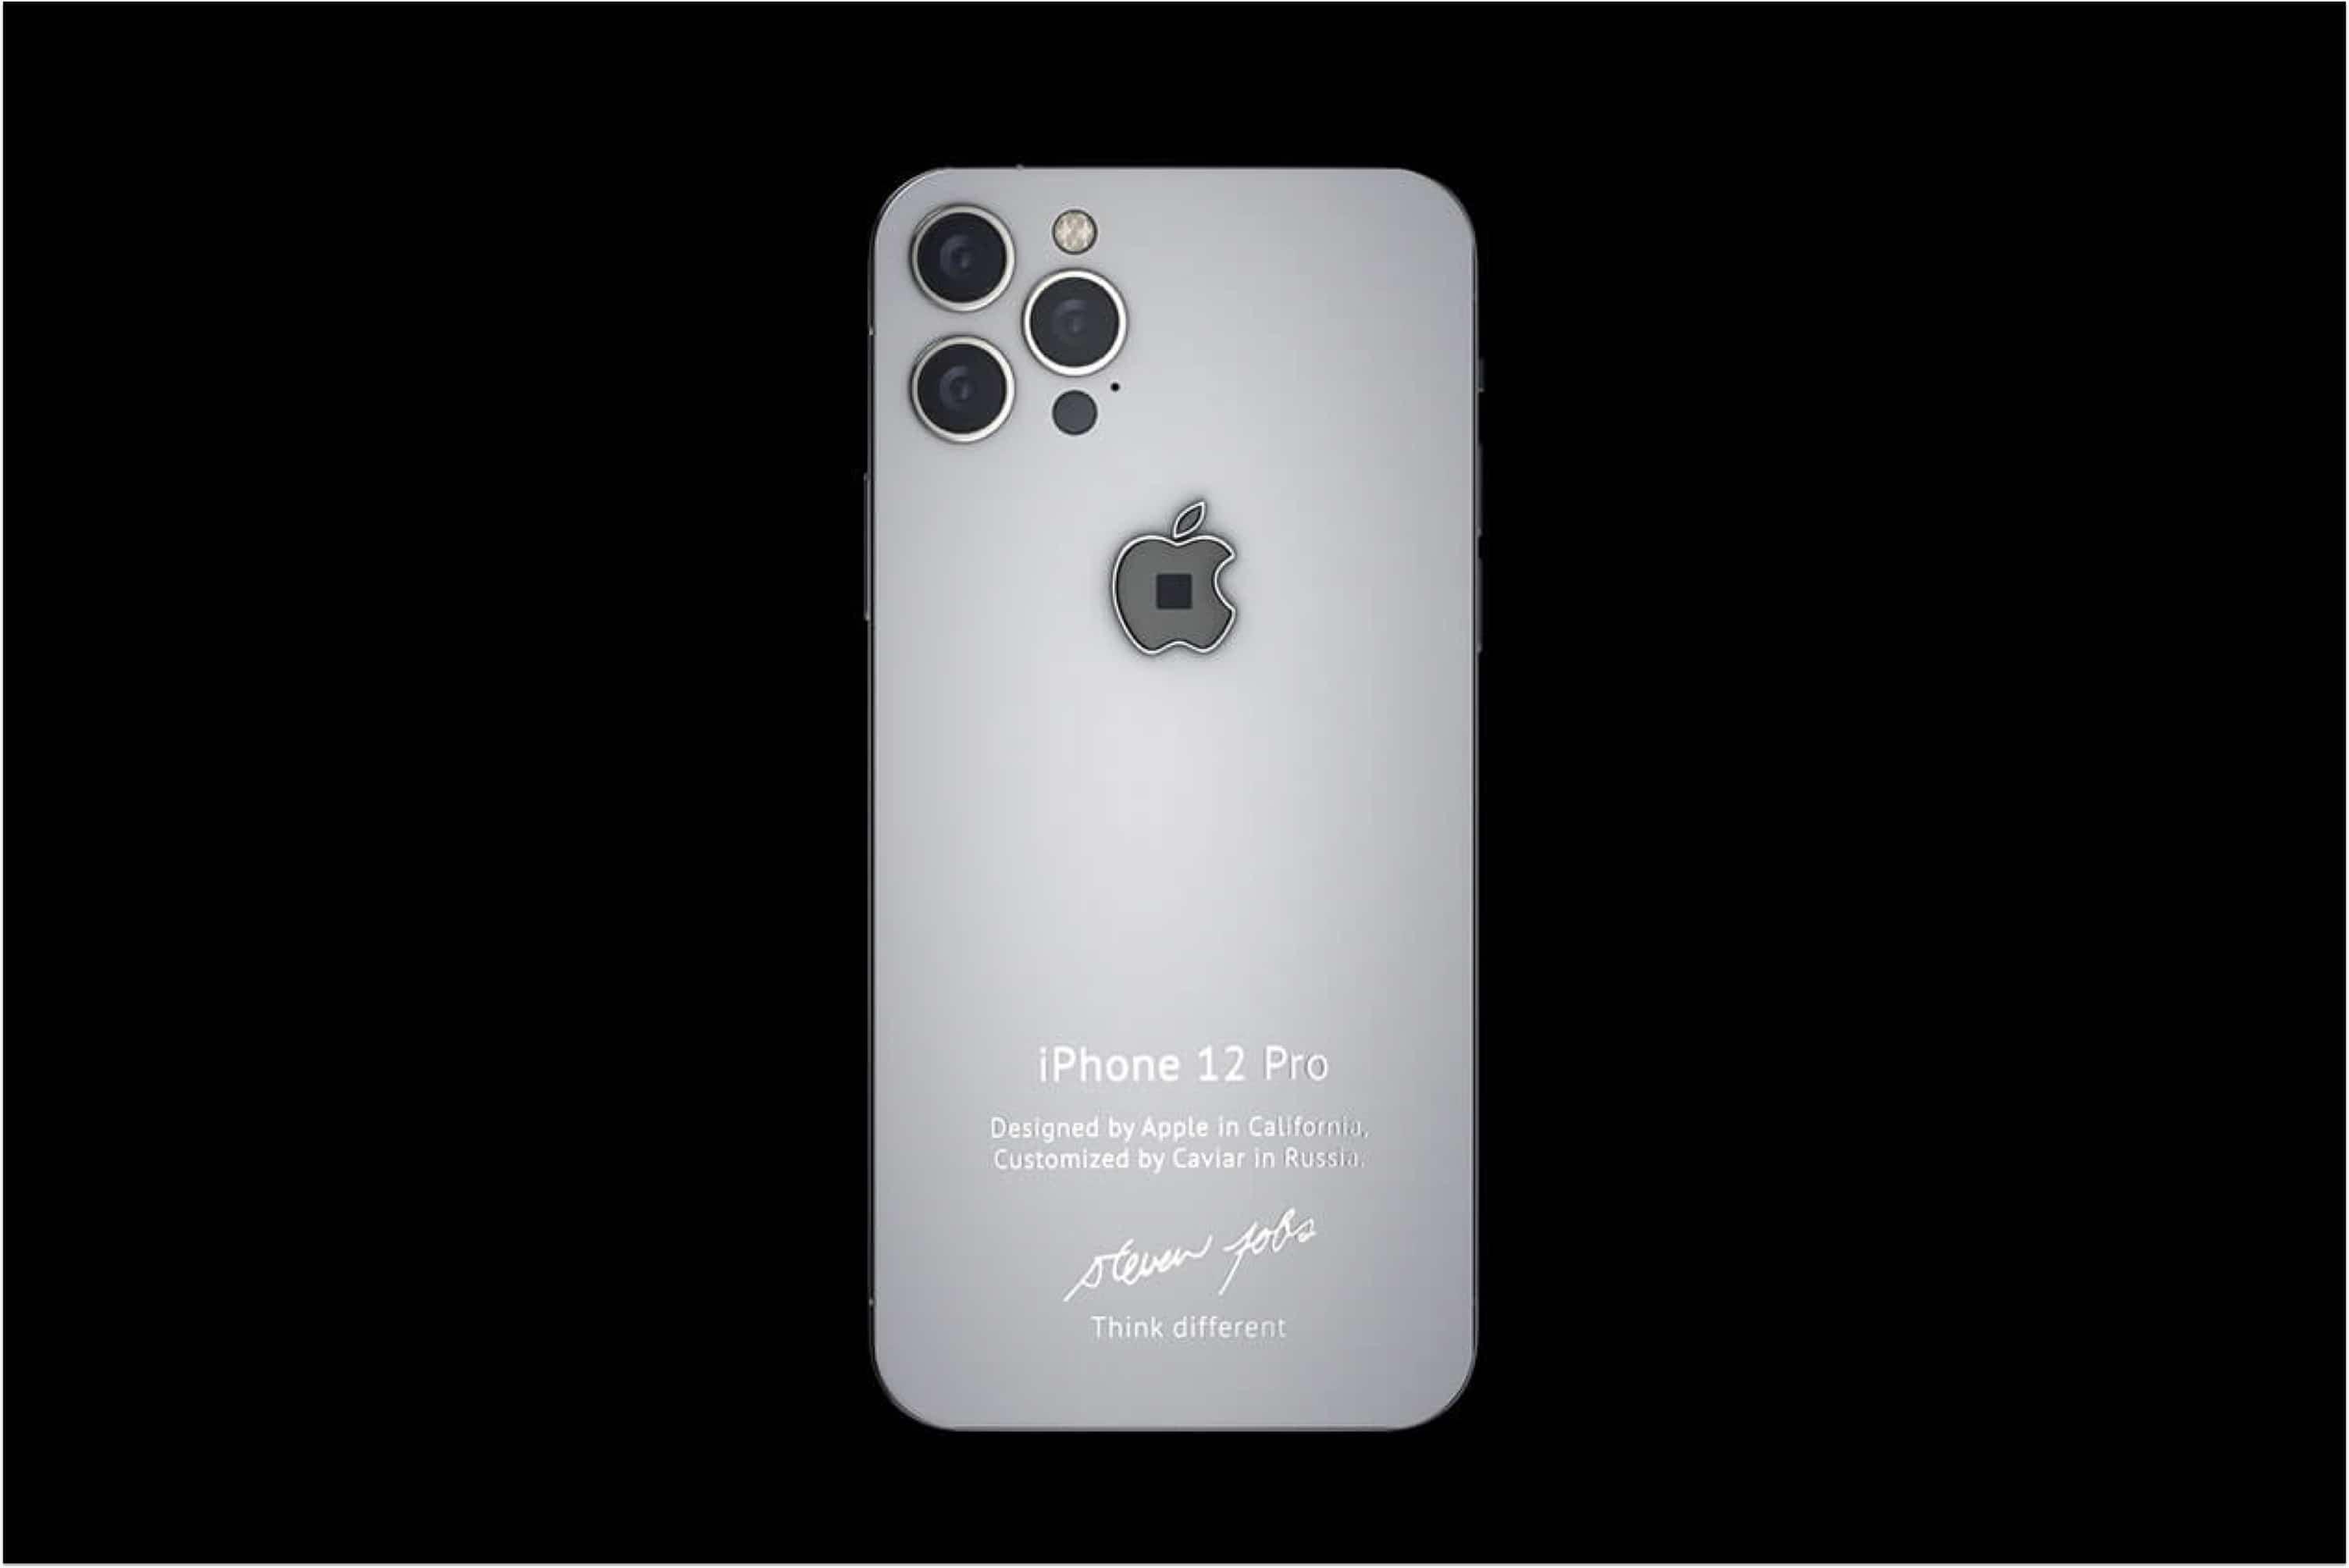 caviar-s-iphone-12-pro-casing-features-steve-jobs-iconic-turtleneck-20201210-1